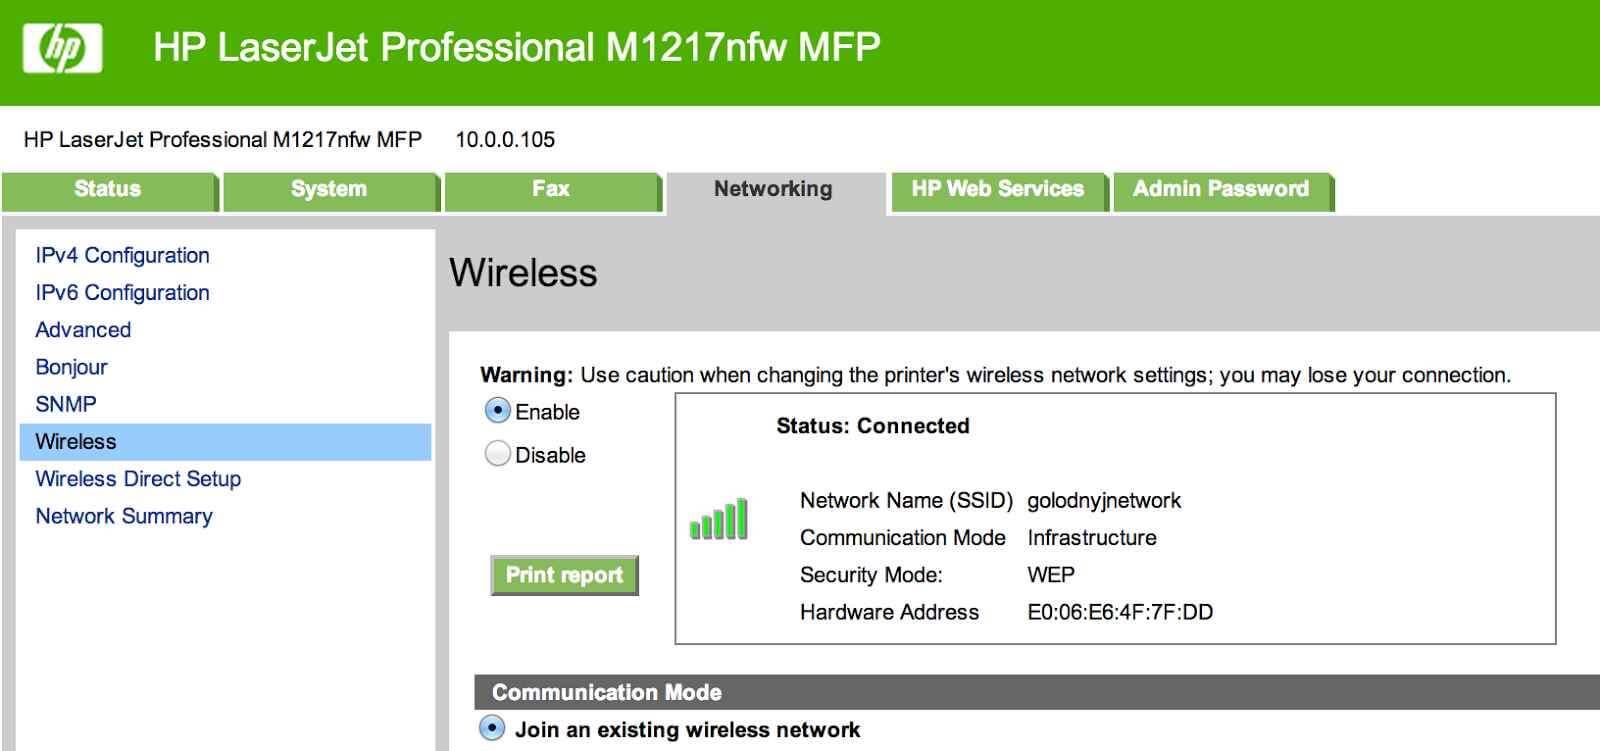 Как настроить принтер HP LaserJet M1217nfw MFP через WiFi-02